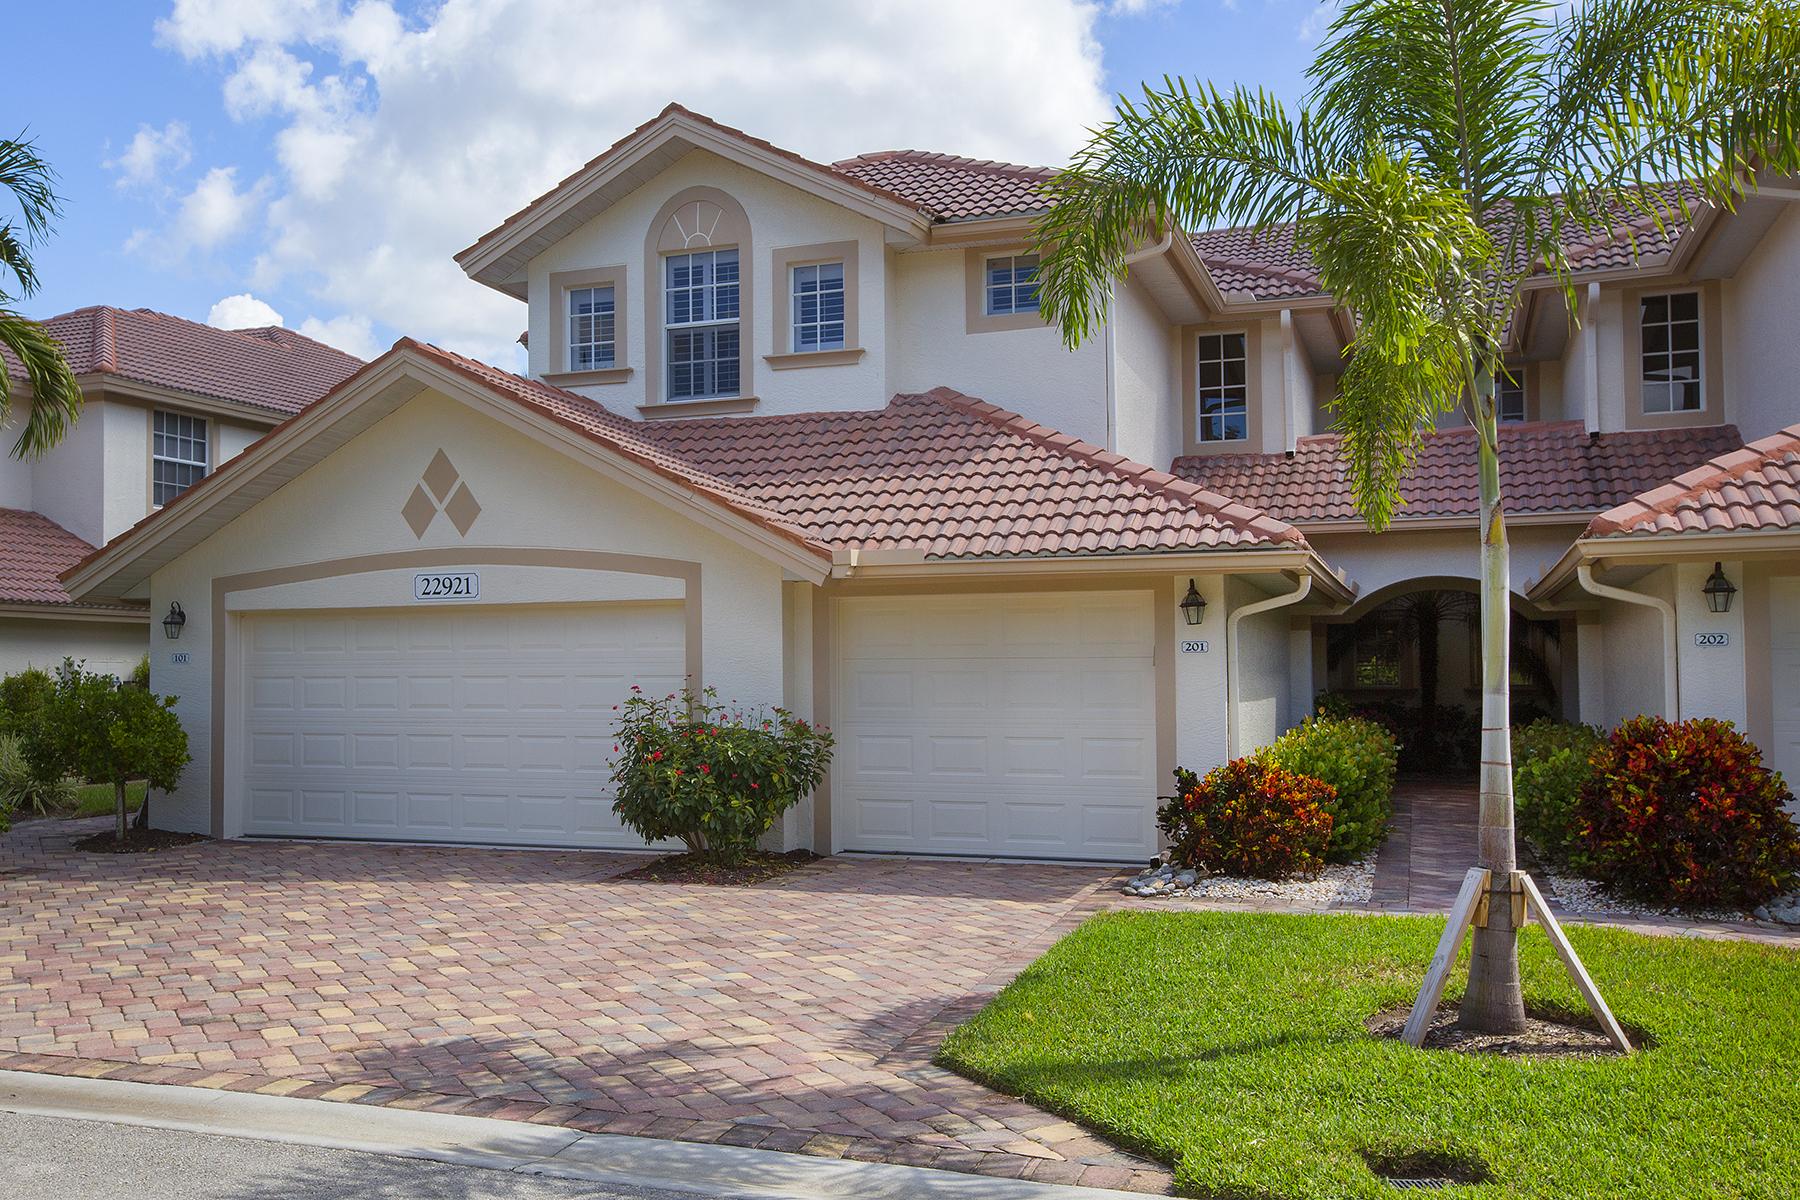 Condomínio para Venda às MORNINGSIDE 22921 Rosedale Dr 201 Estero, Florida, 34135 Estados Unidos